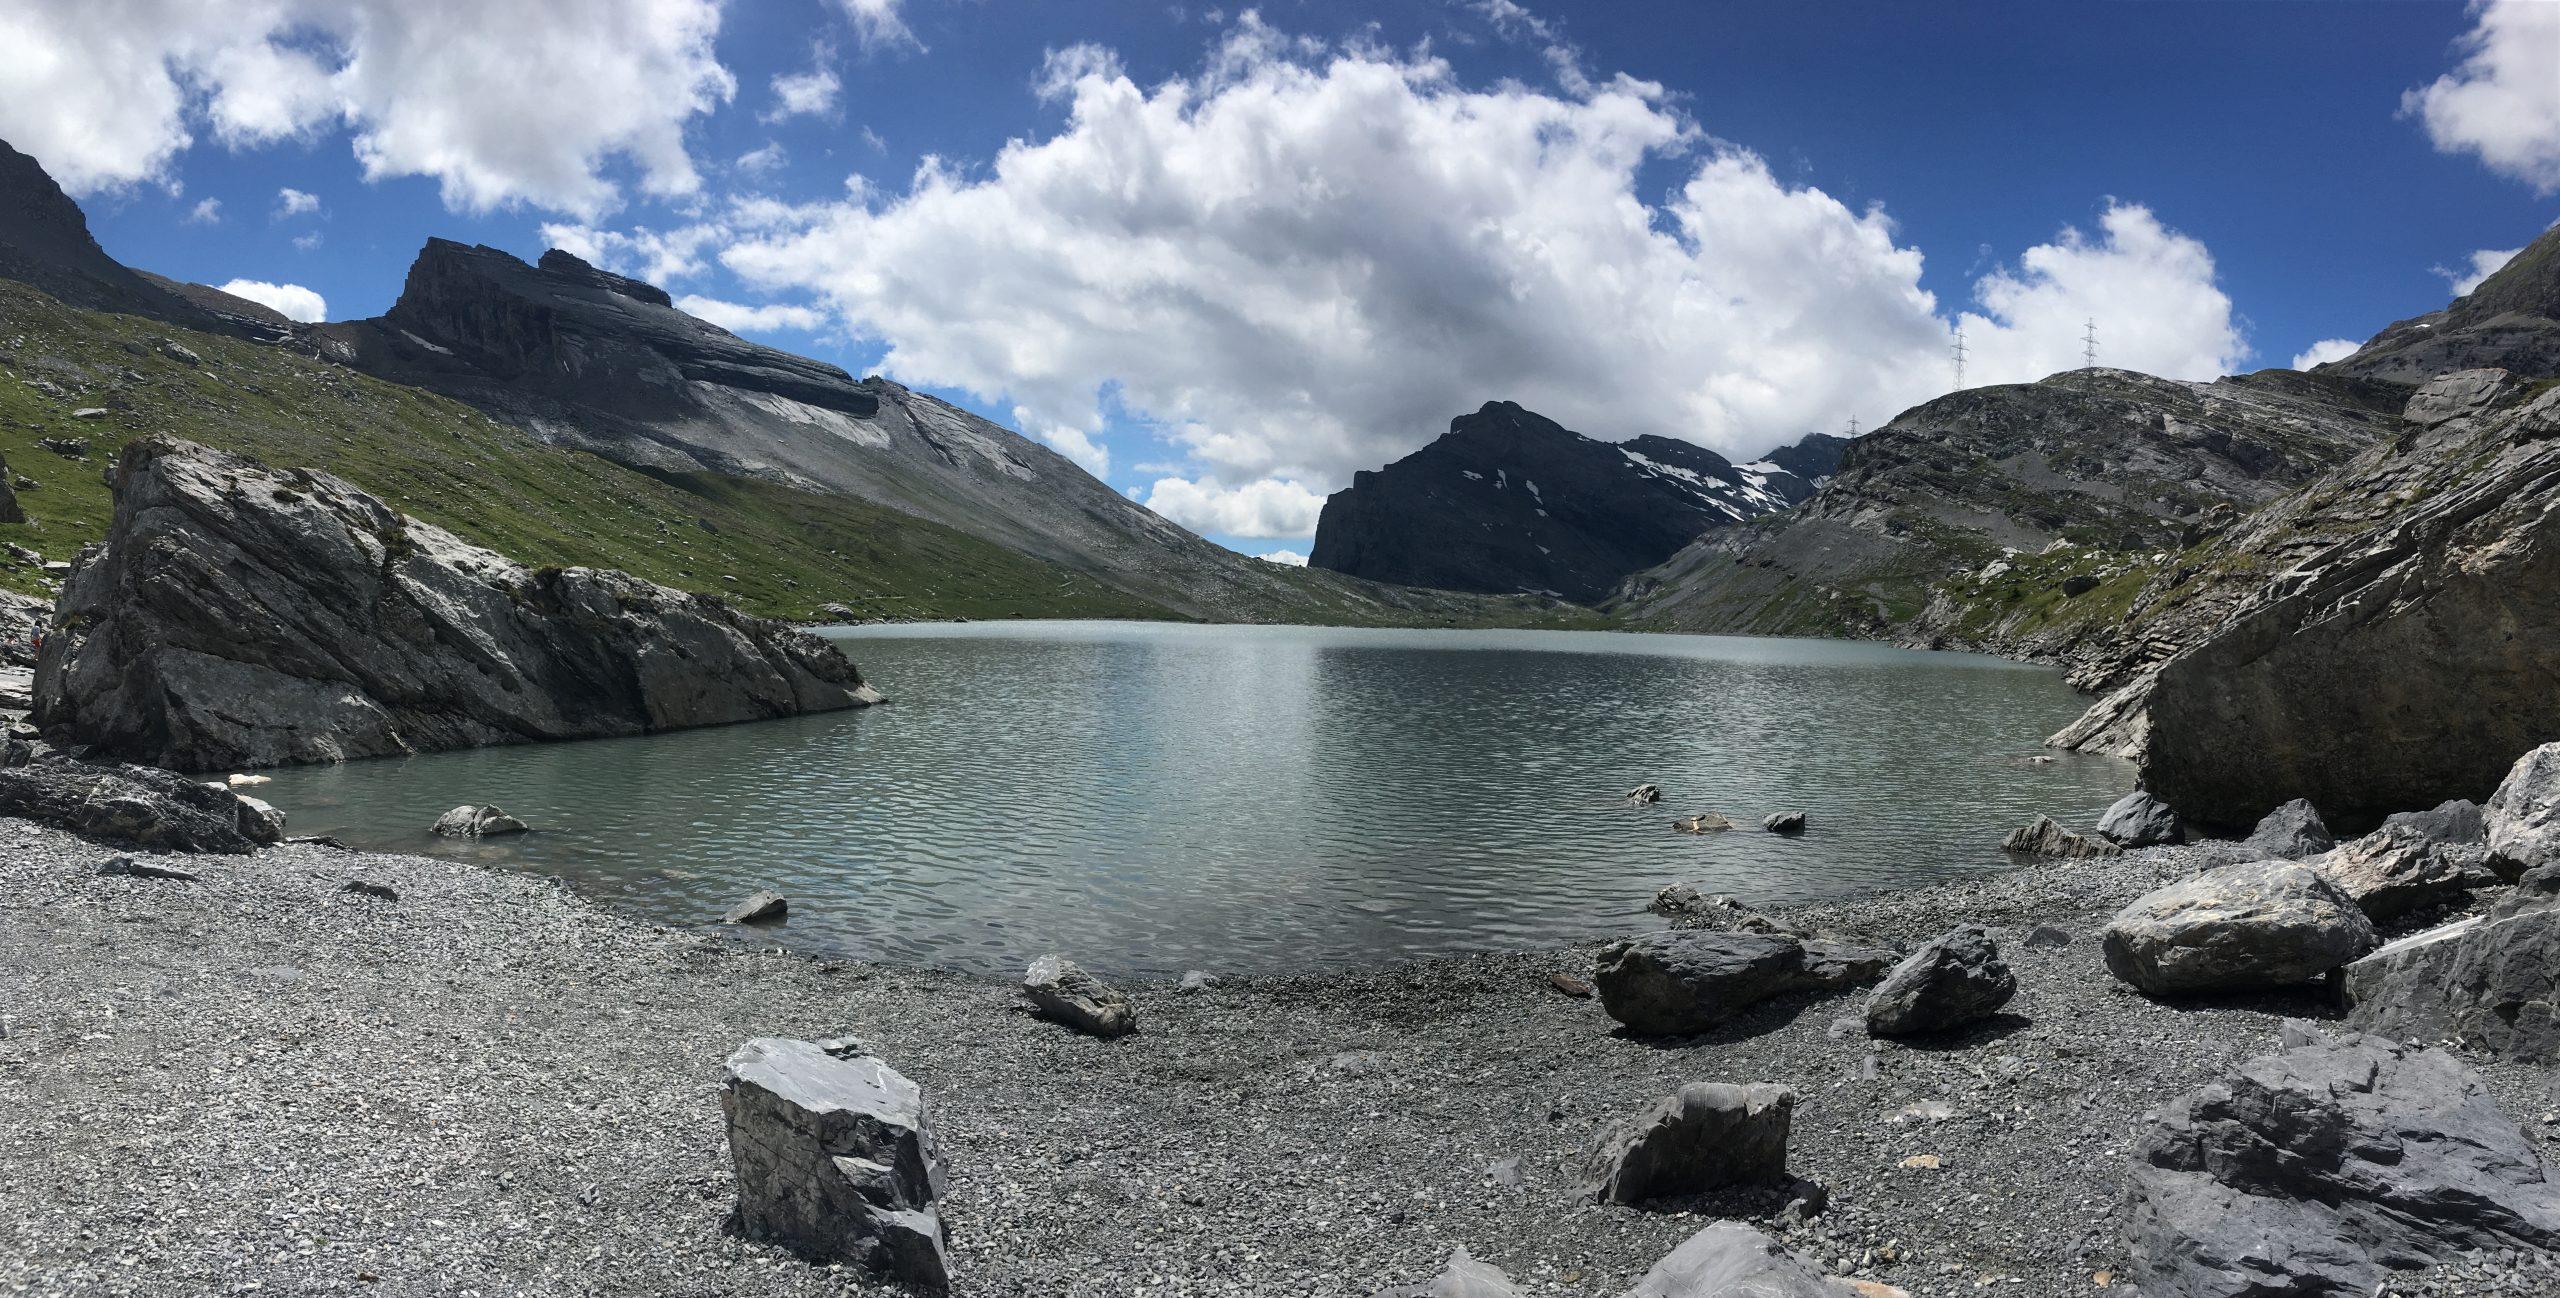 swiss alps – Daubensee Lake Hike